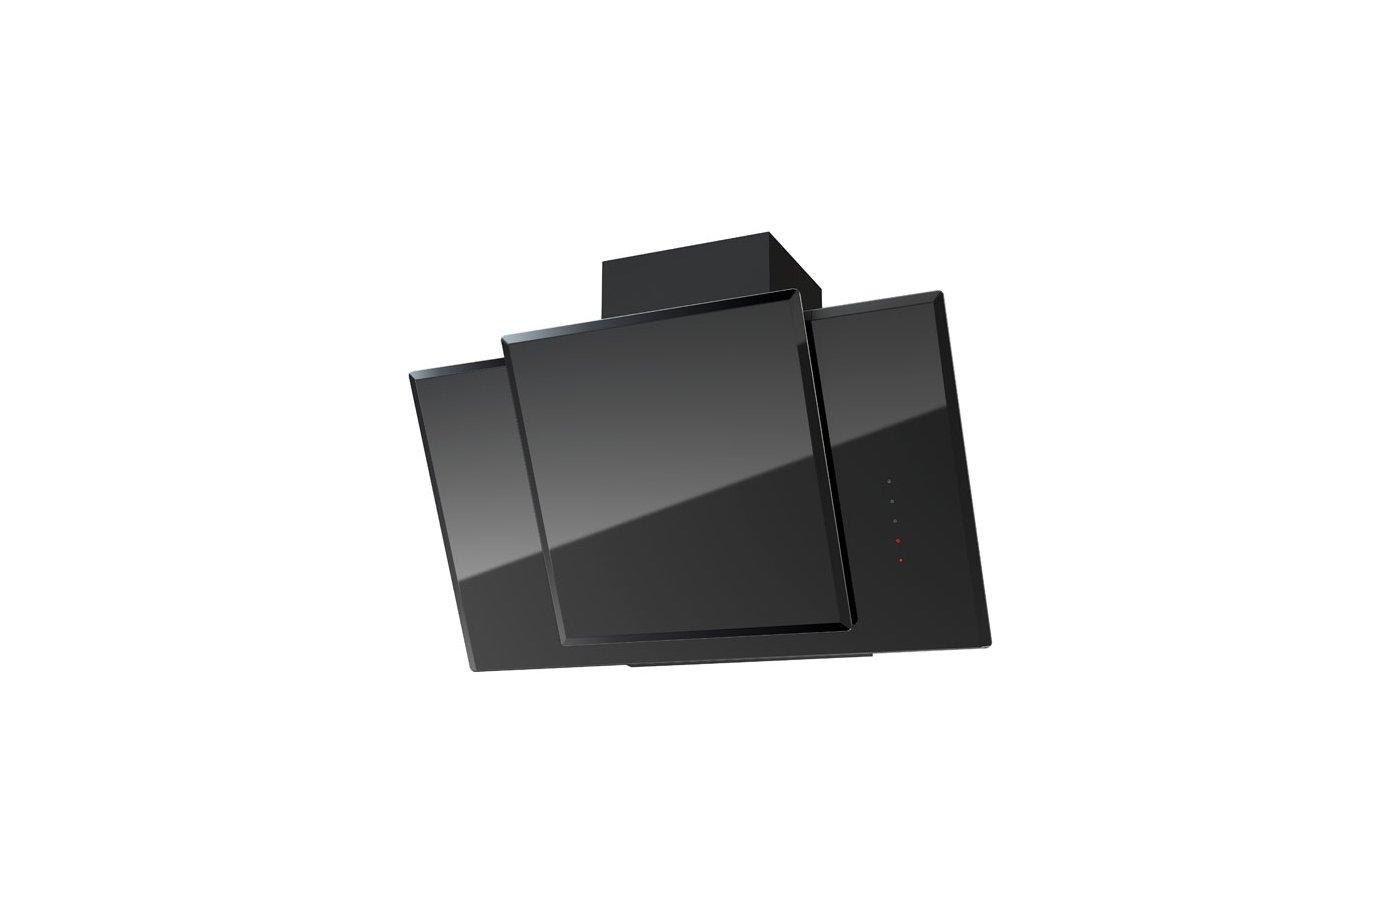 Вытяжка KRONA NATALI 900 BLACK 3P-S